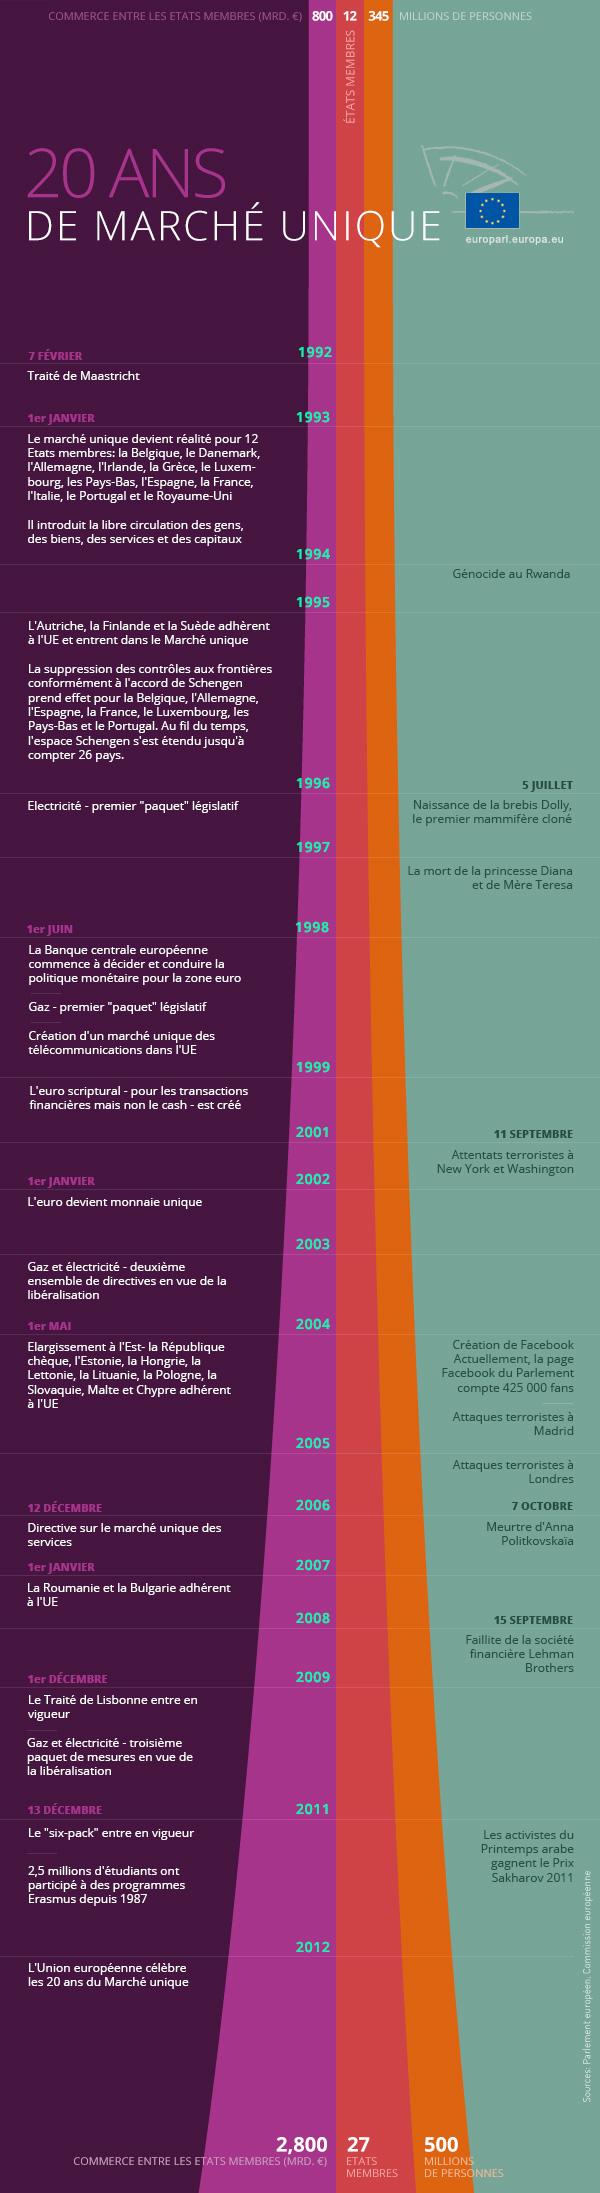 Infographic: 20 years of Single market - https://hugin.info/155378/I/1648869/25109.jpg